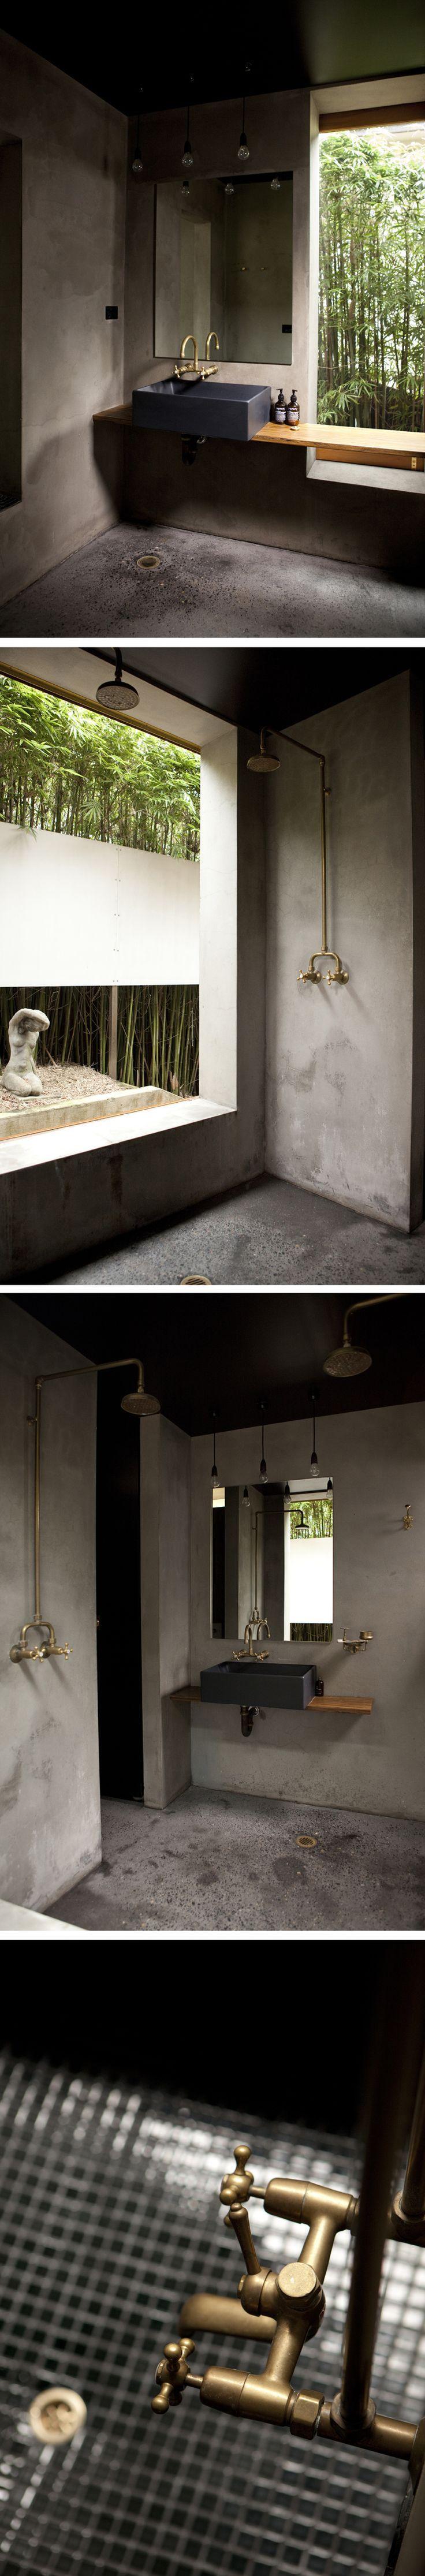 20 Amazing Bathroom Designs with Concrete | DesignRulz